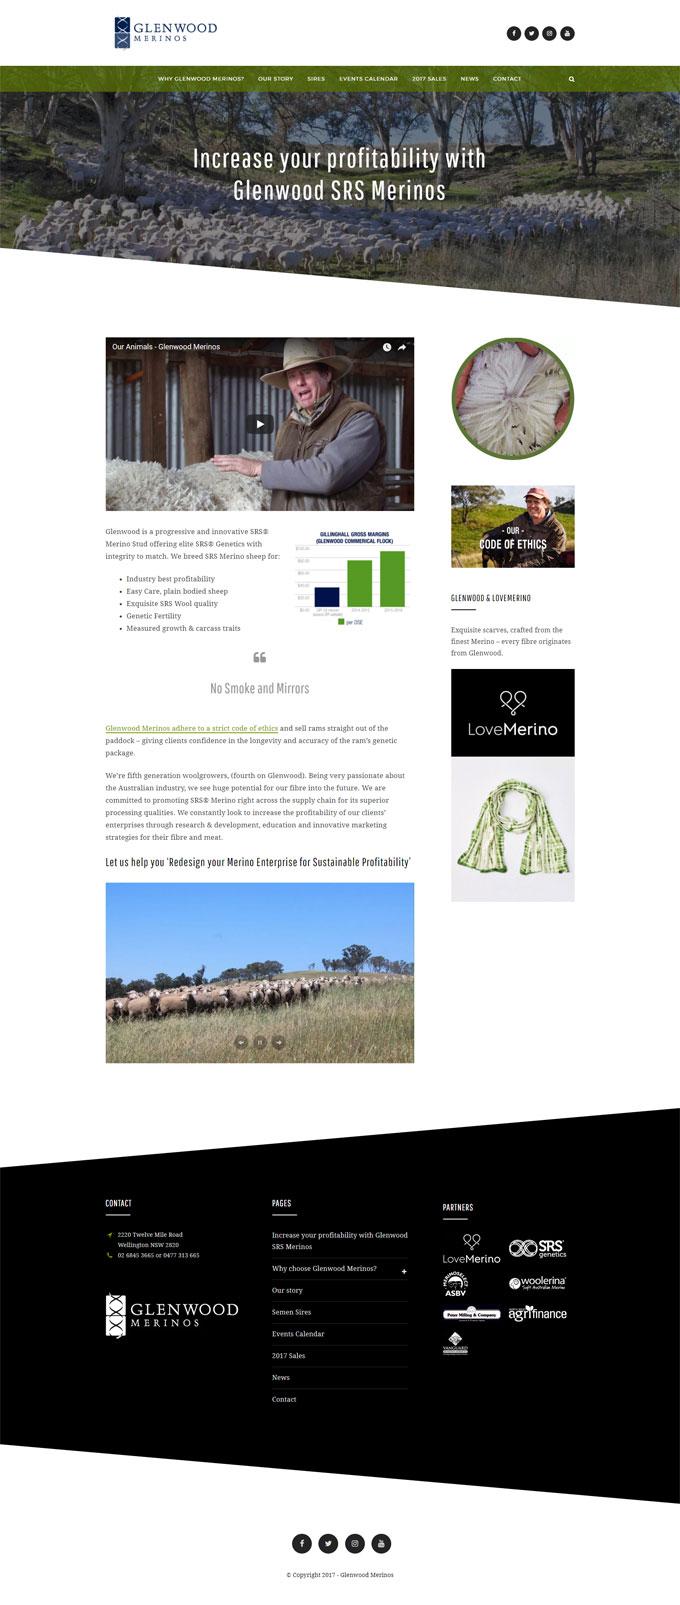 Glenwood-Merinos-homepage